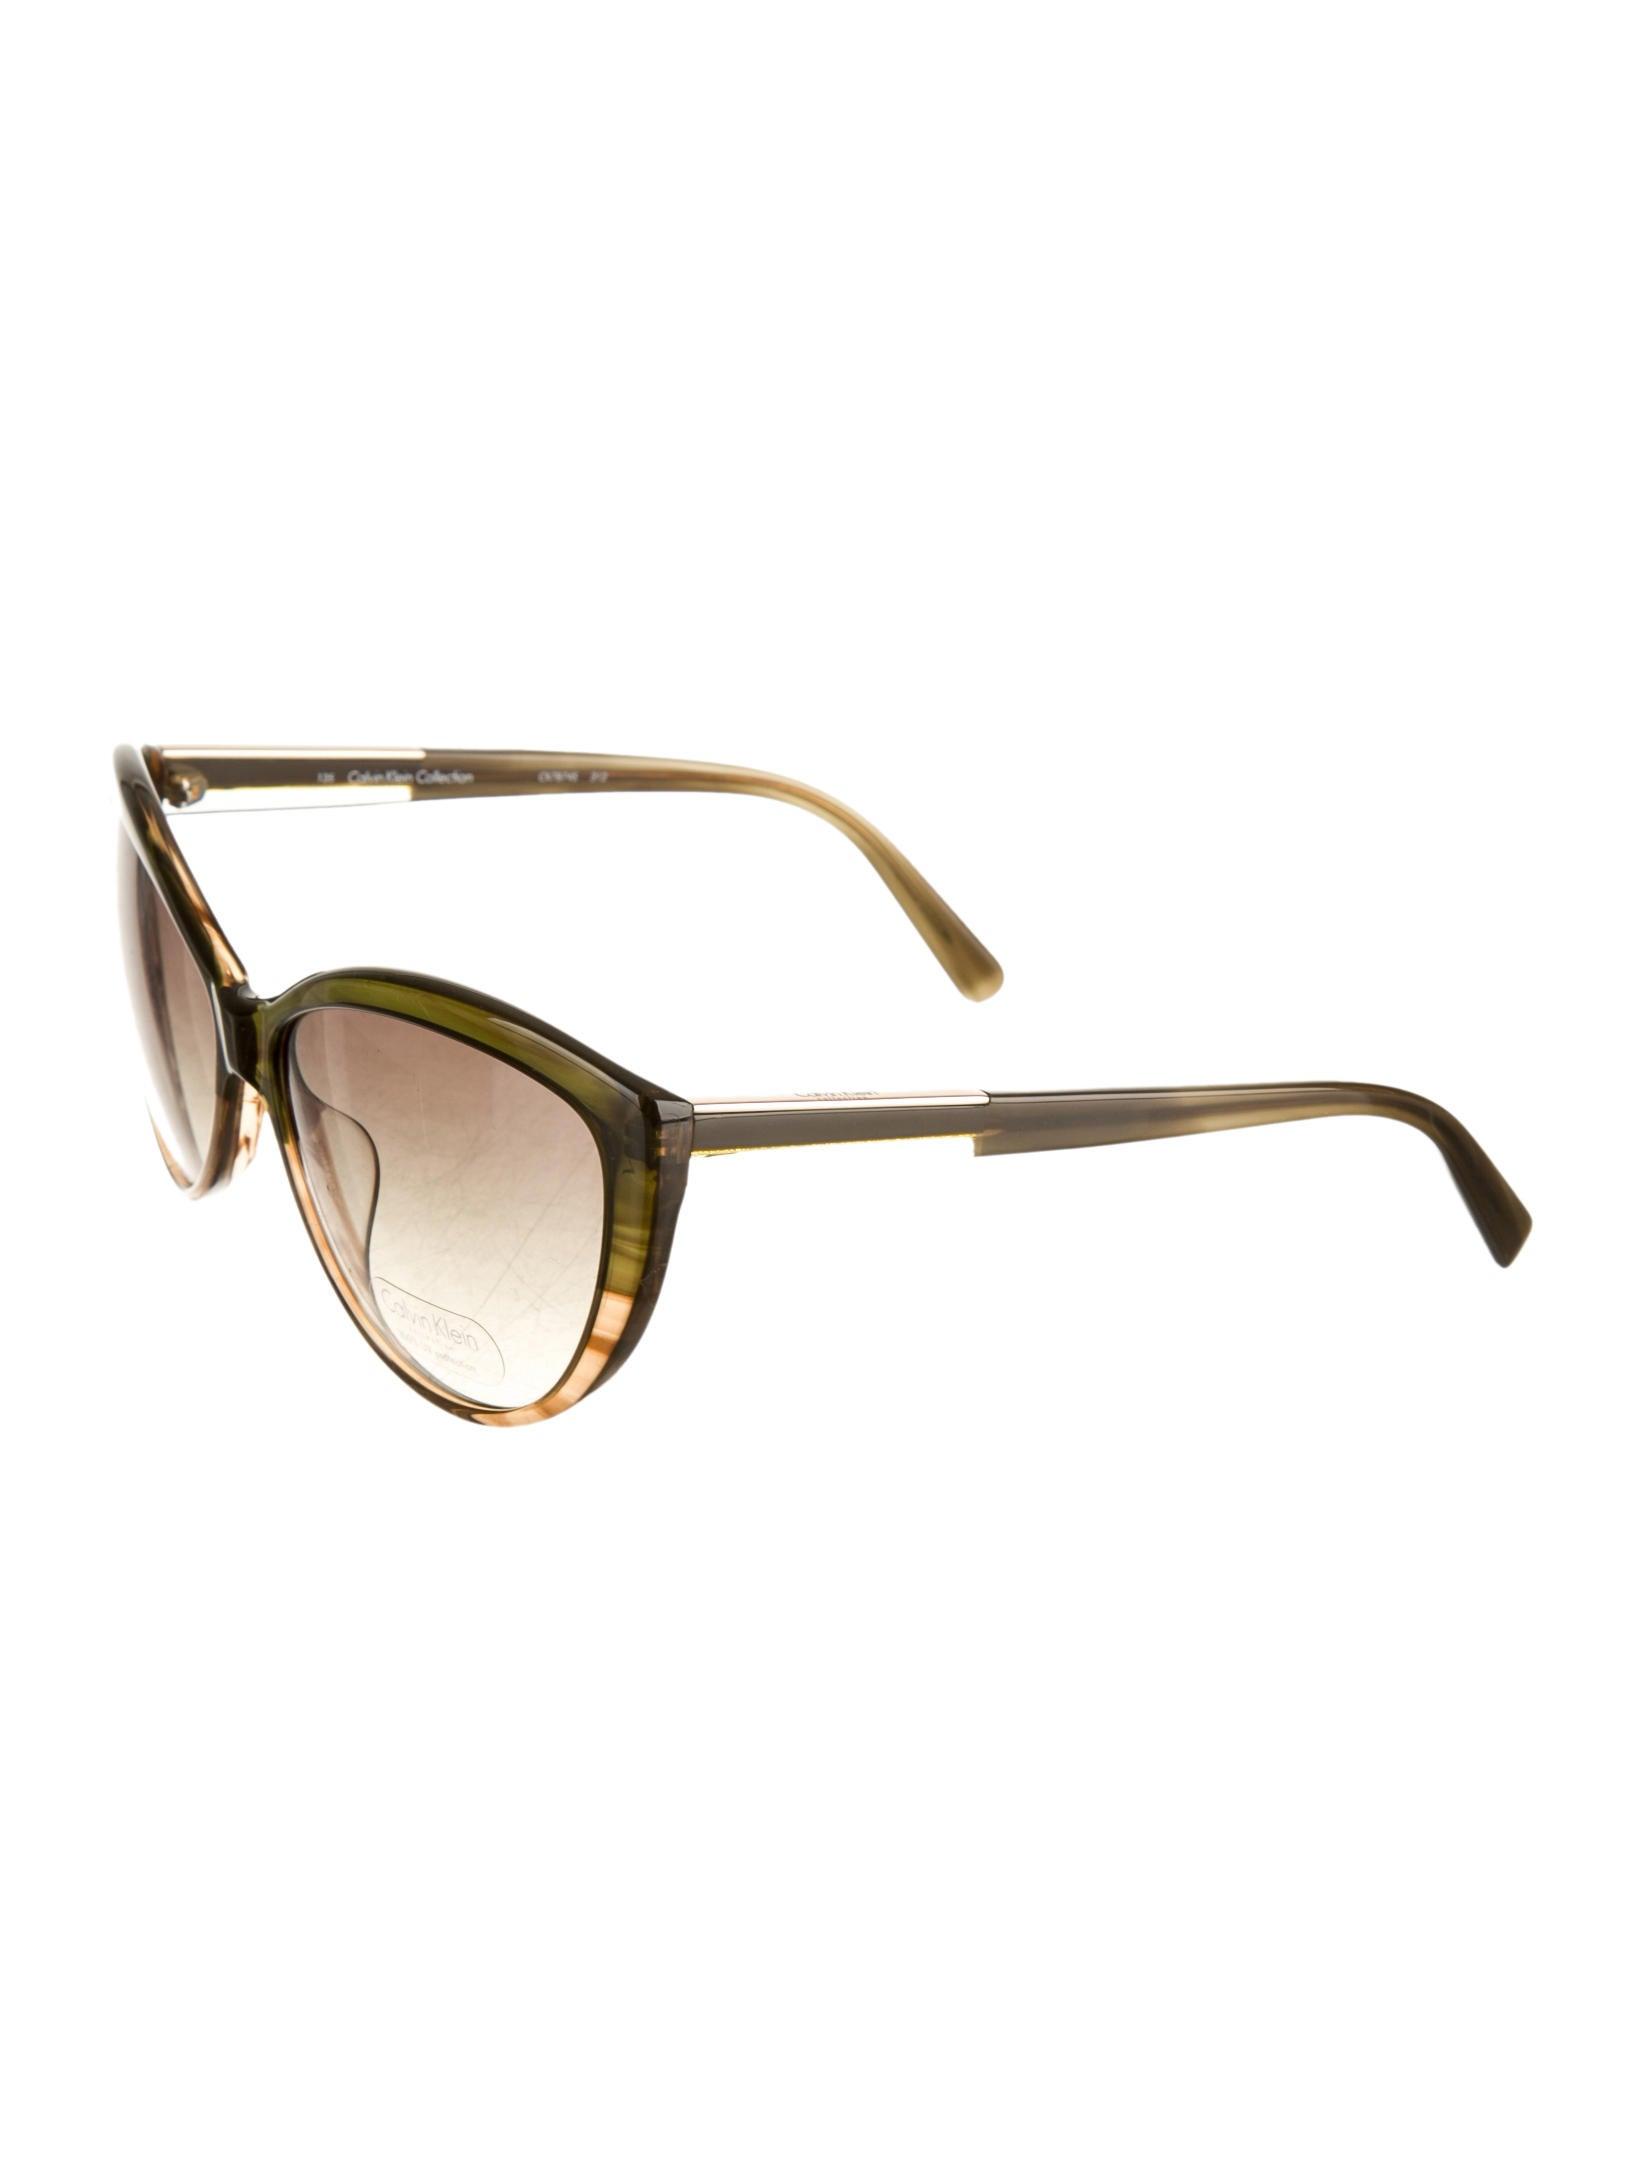 Calvin Klein Cat Eye Sunglasses  calvin klein collection cat eye sunglasses accessories